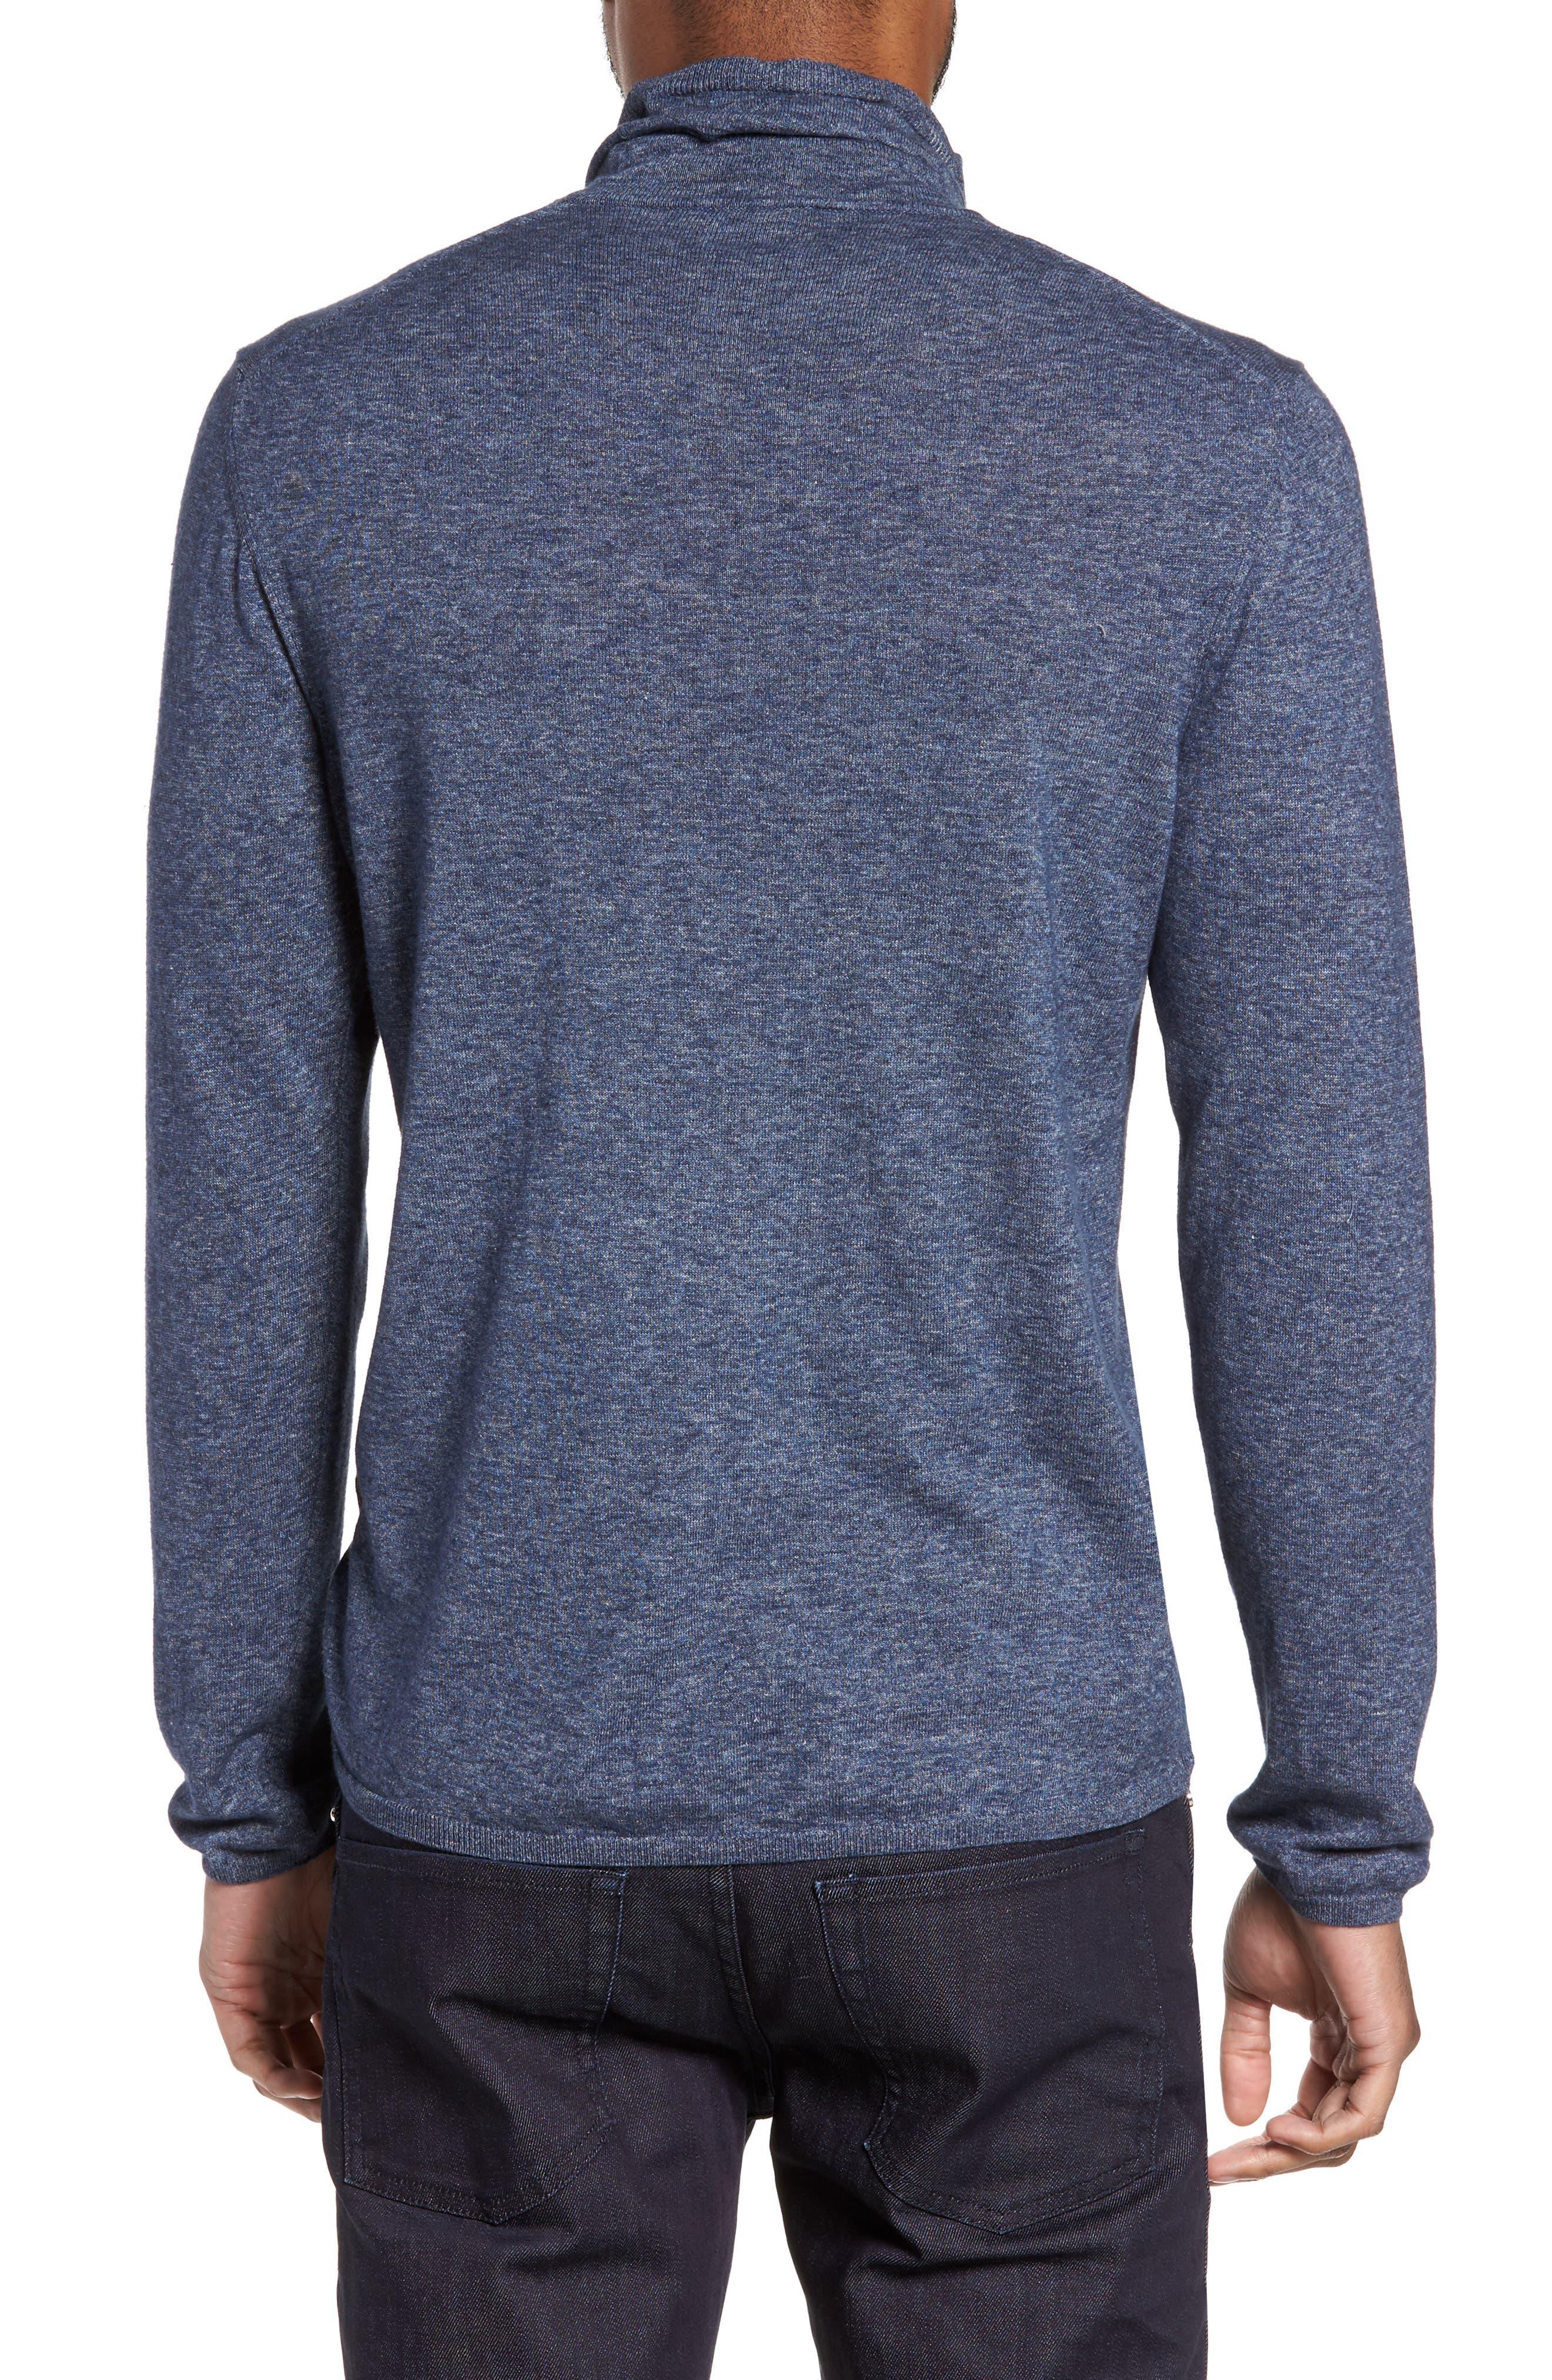 Hess Wool Turtleneck Sweater,                             Alternate thumbnail 4, color,